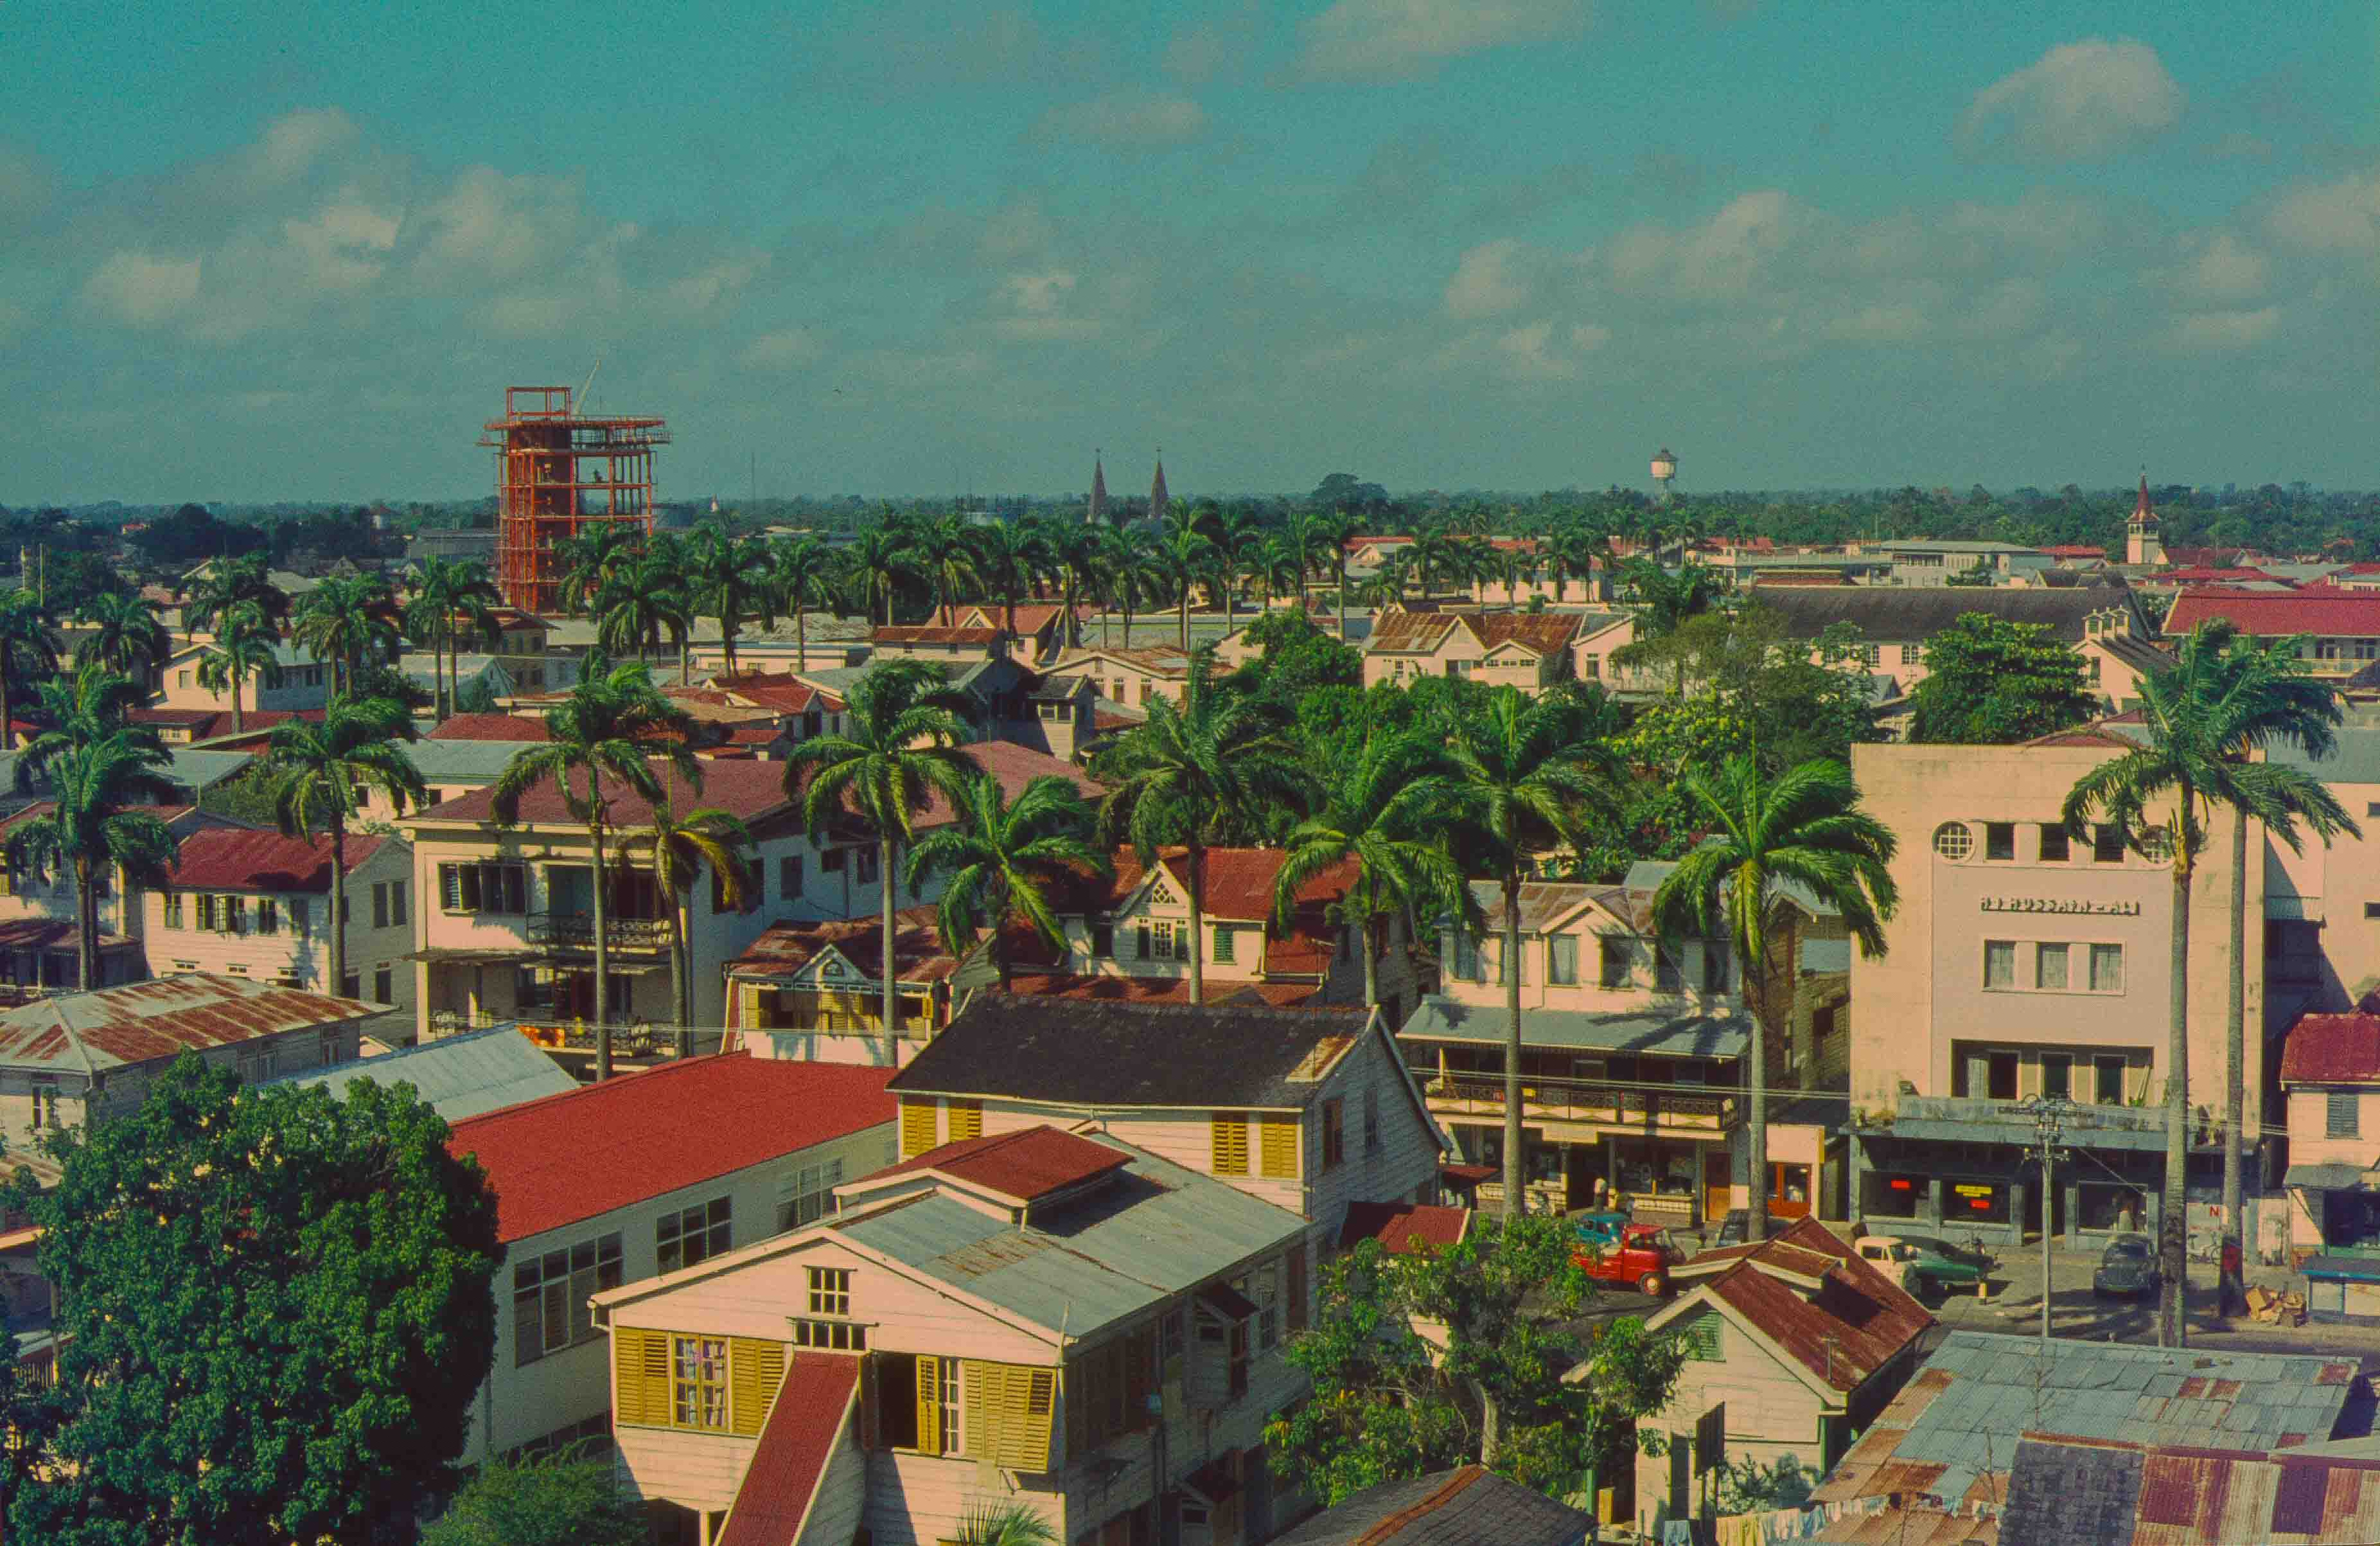 143. Suriname